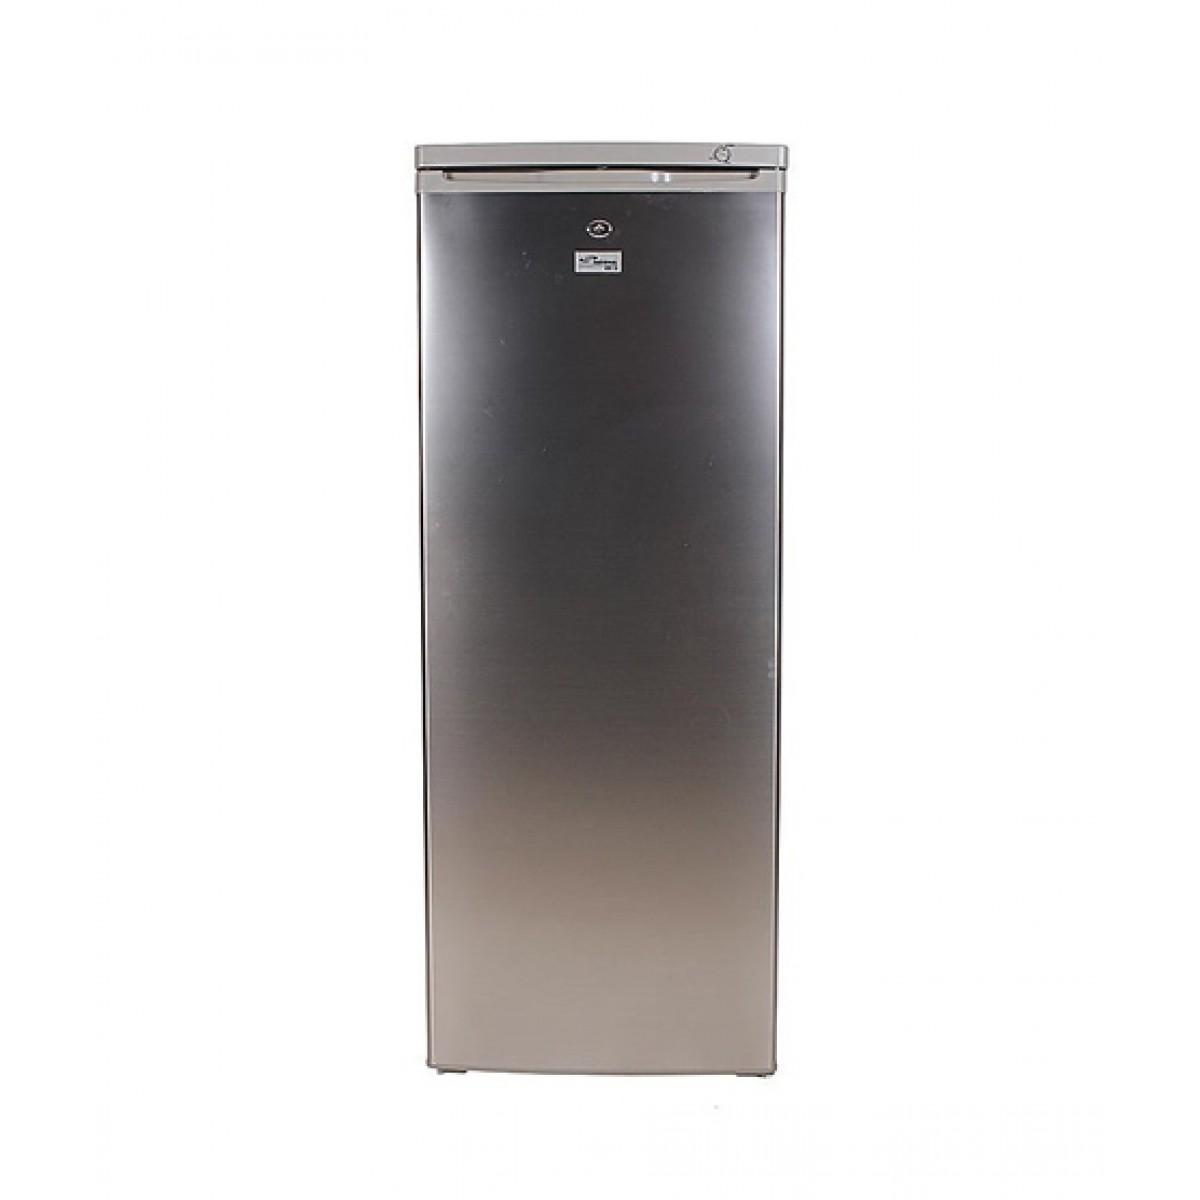 Gaba National Upright D-Frost Freezer (GF-250 DC)